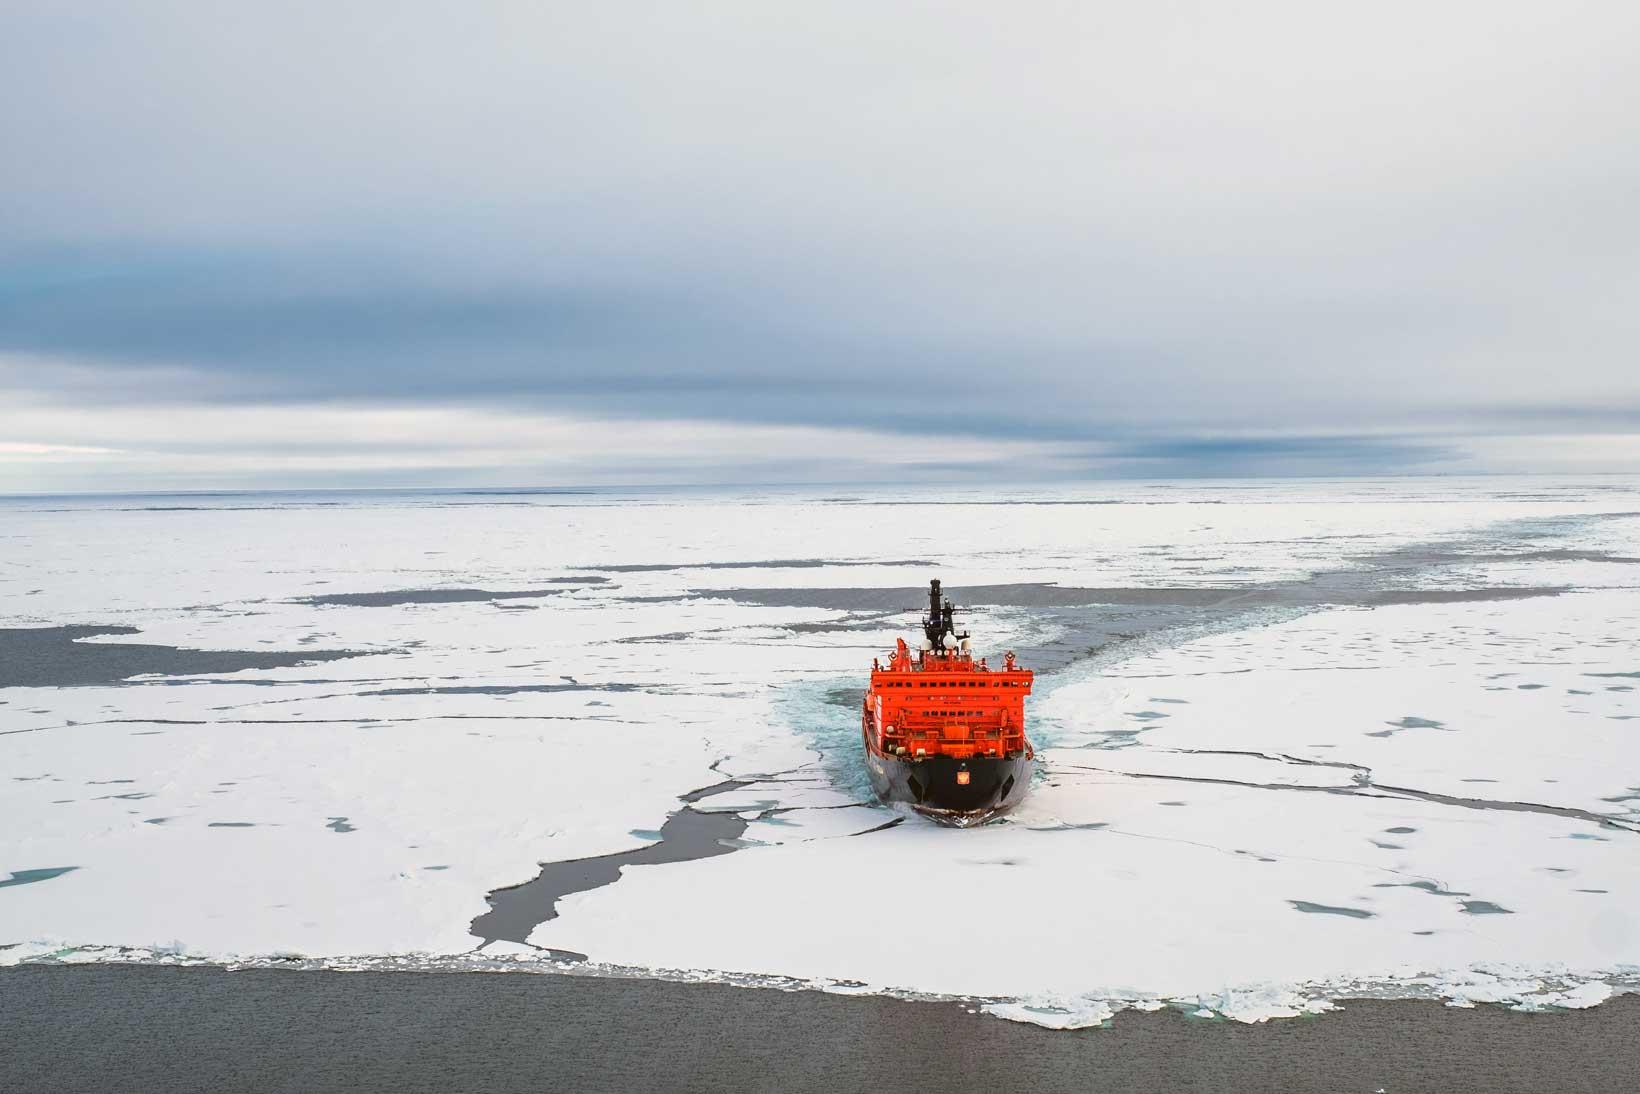 Icebreaker in the Arctic